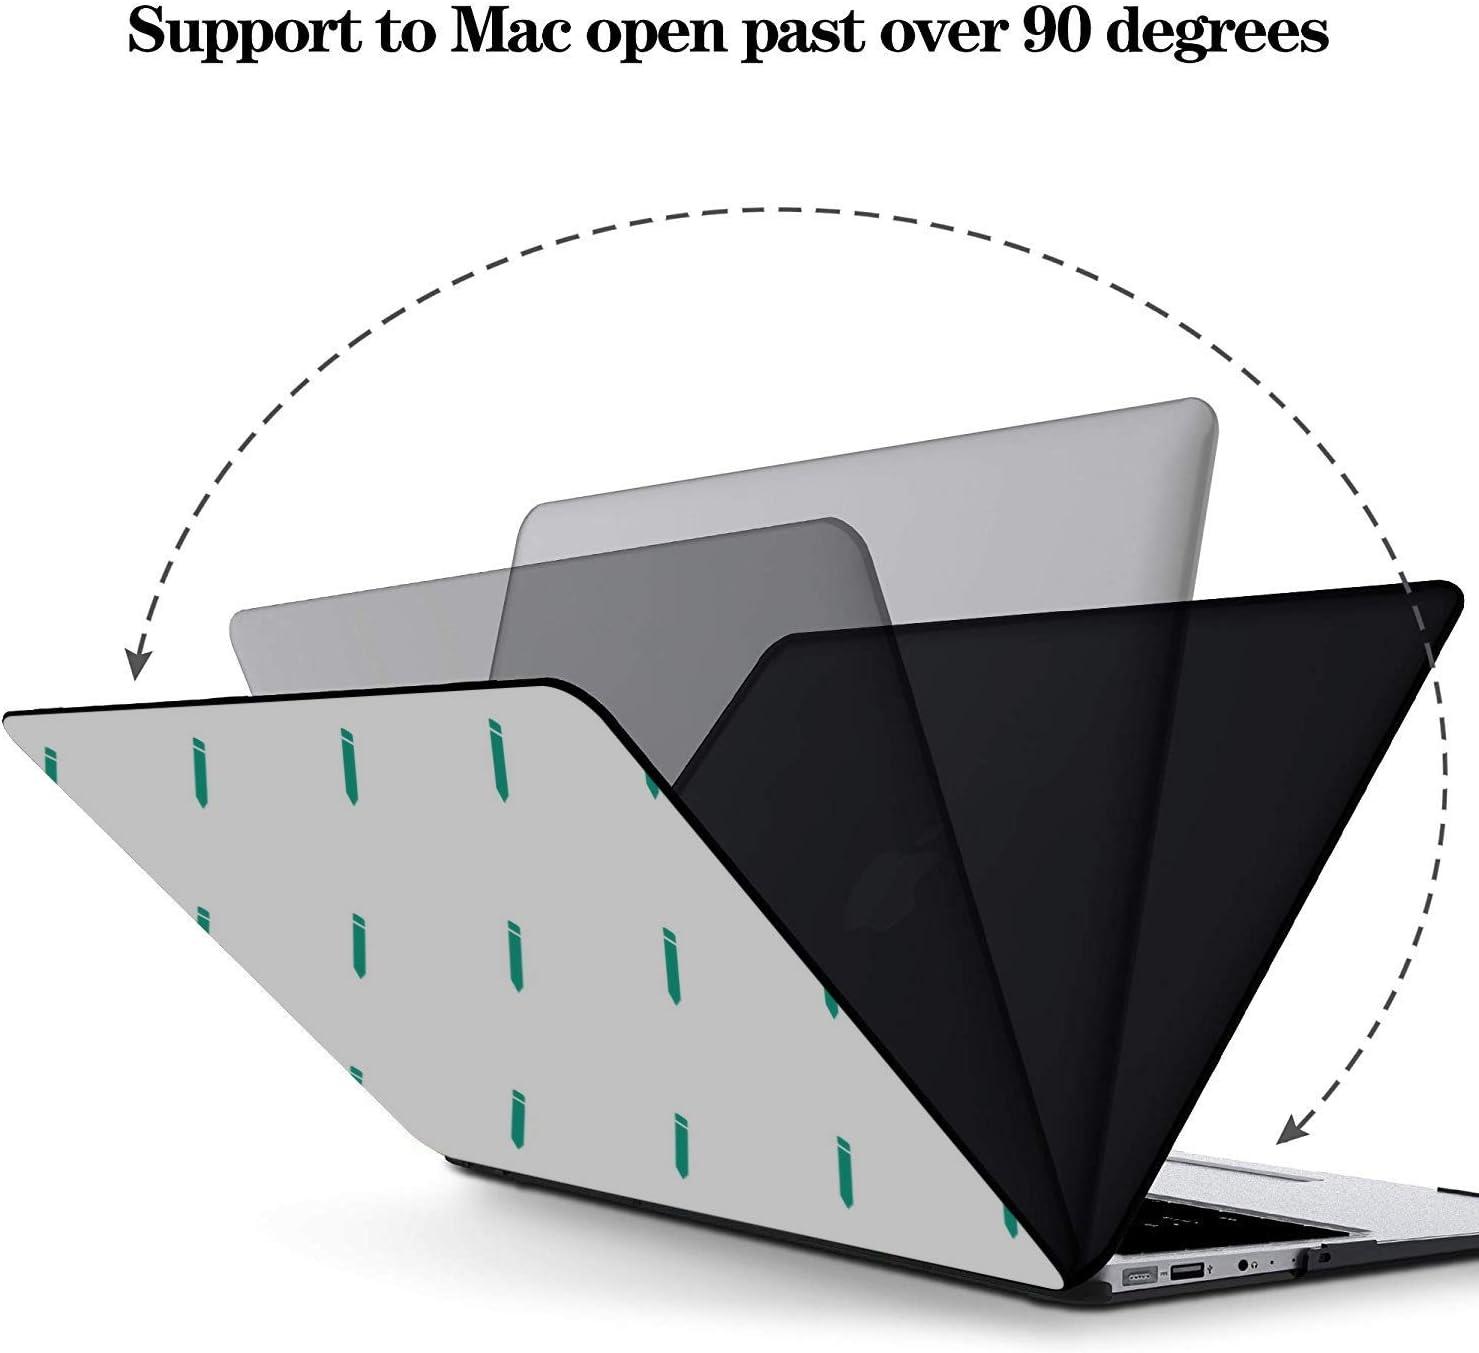 A1706 MacBook Pro Case School Creative Art Fashion Pen Writing Plastic Hard Shell Compatible Mac Air 11 Pro 13 15 2018 MacBook Pro Case Protection for MacBook 2016-2019 Version